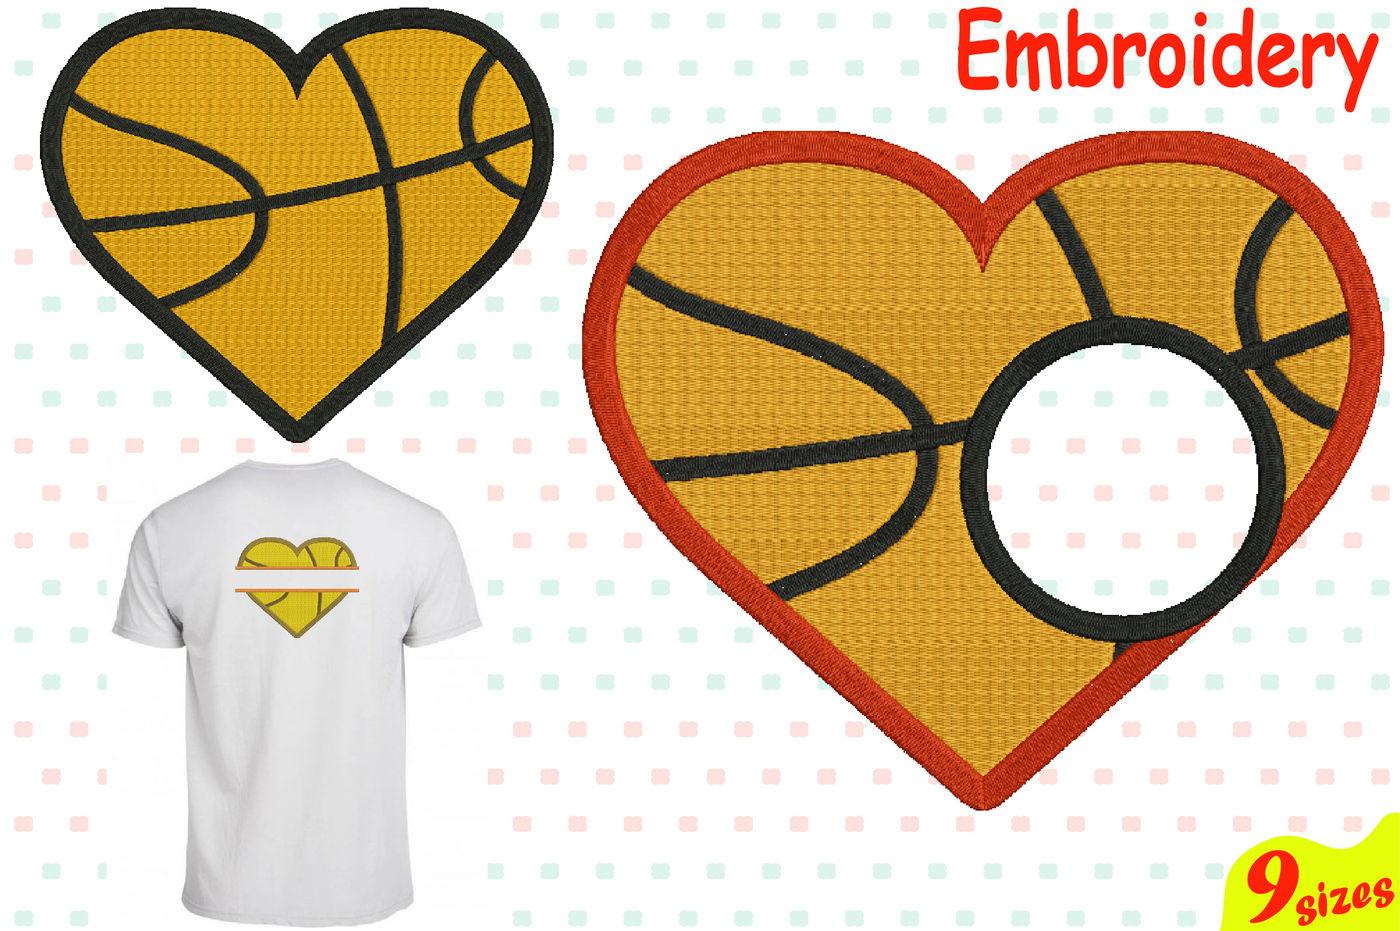 Baschetball Sports Heart Balls Designs For Embroidery Machine